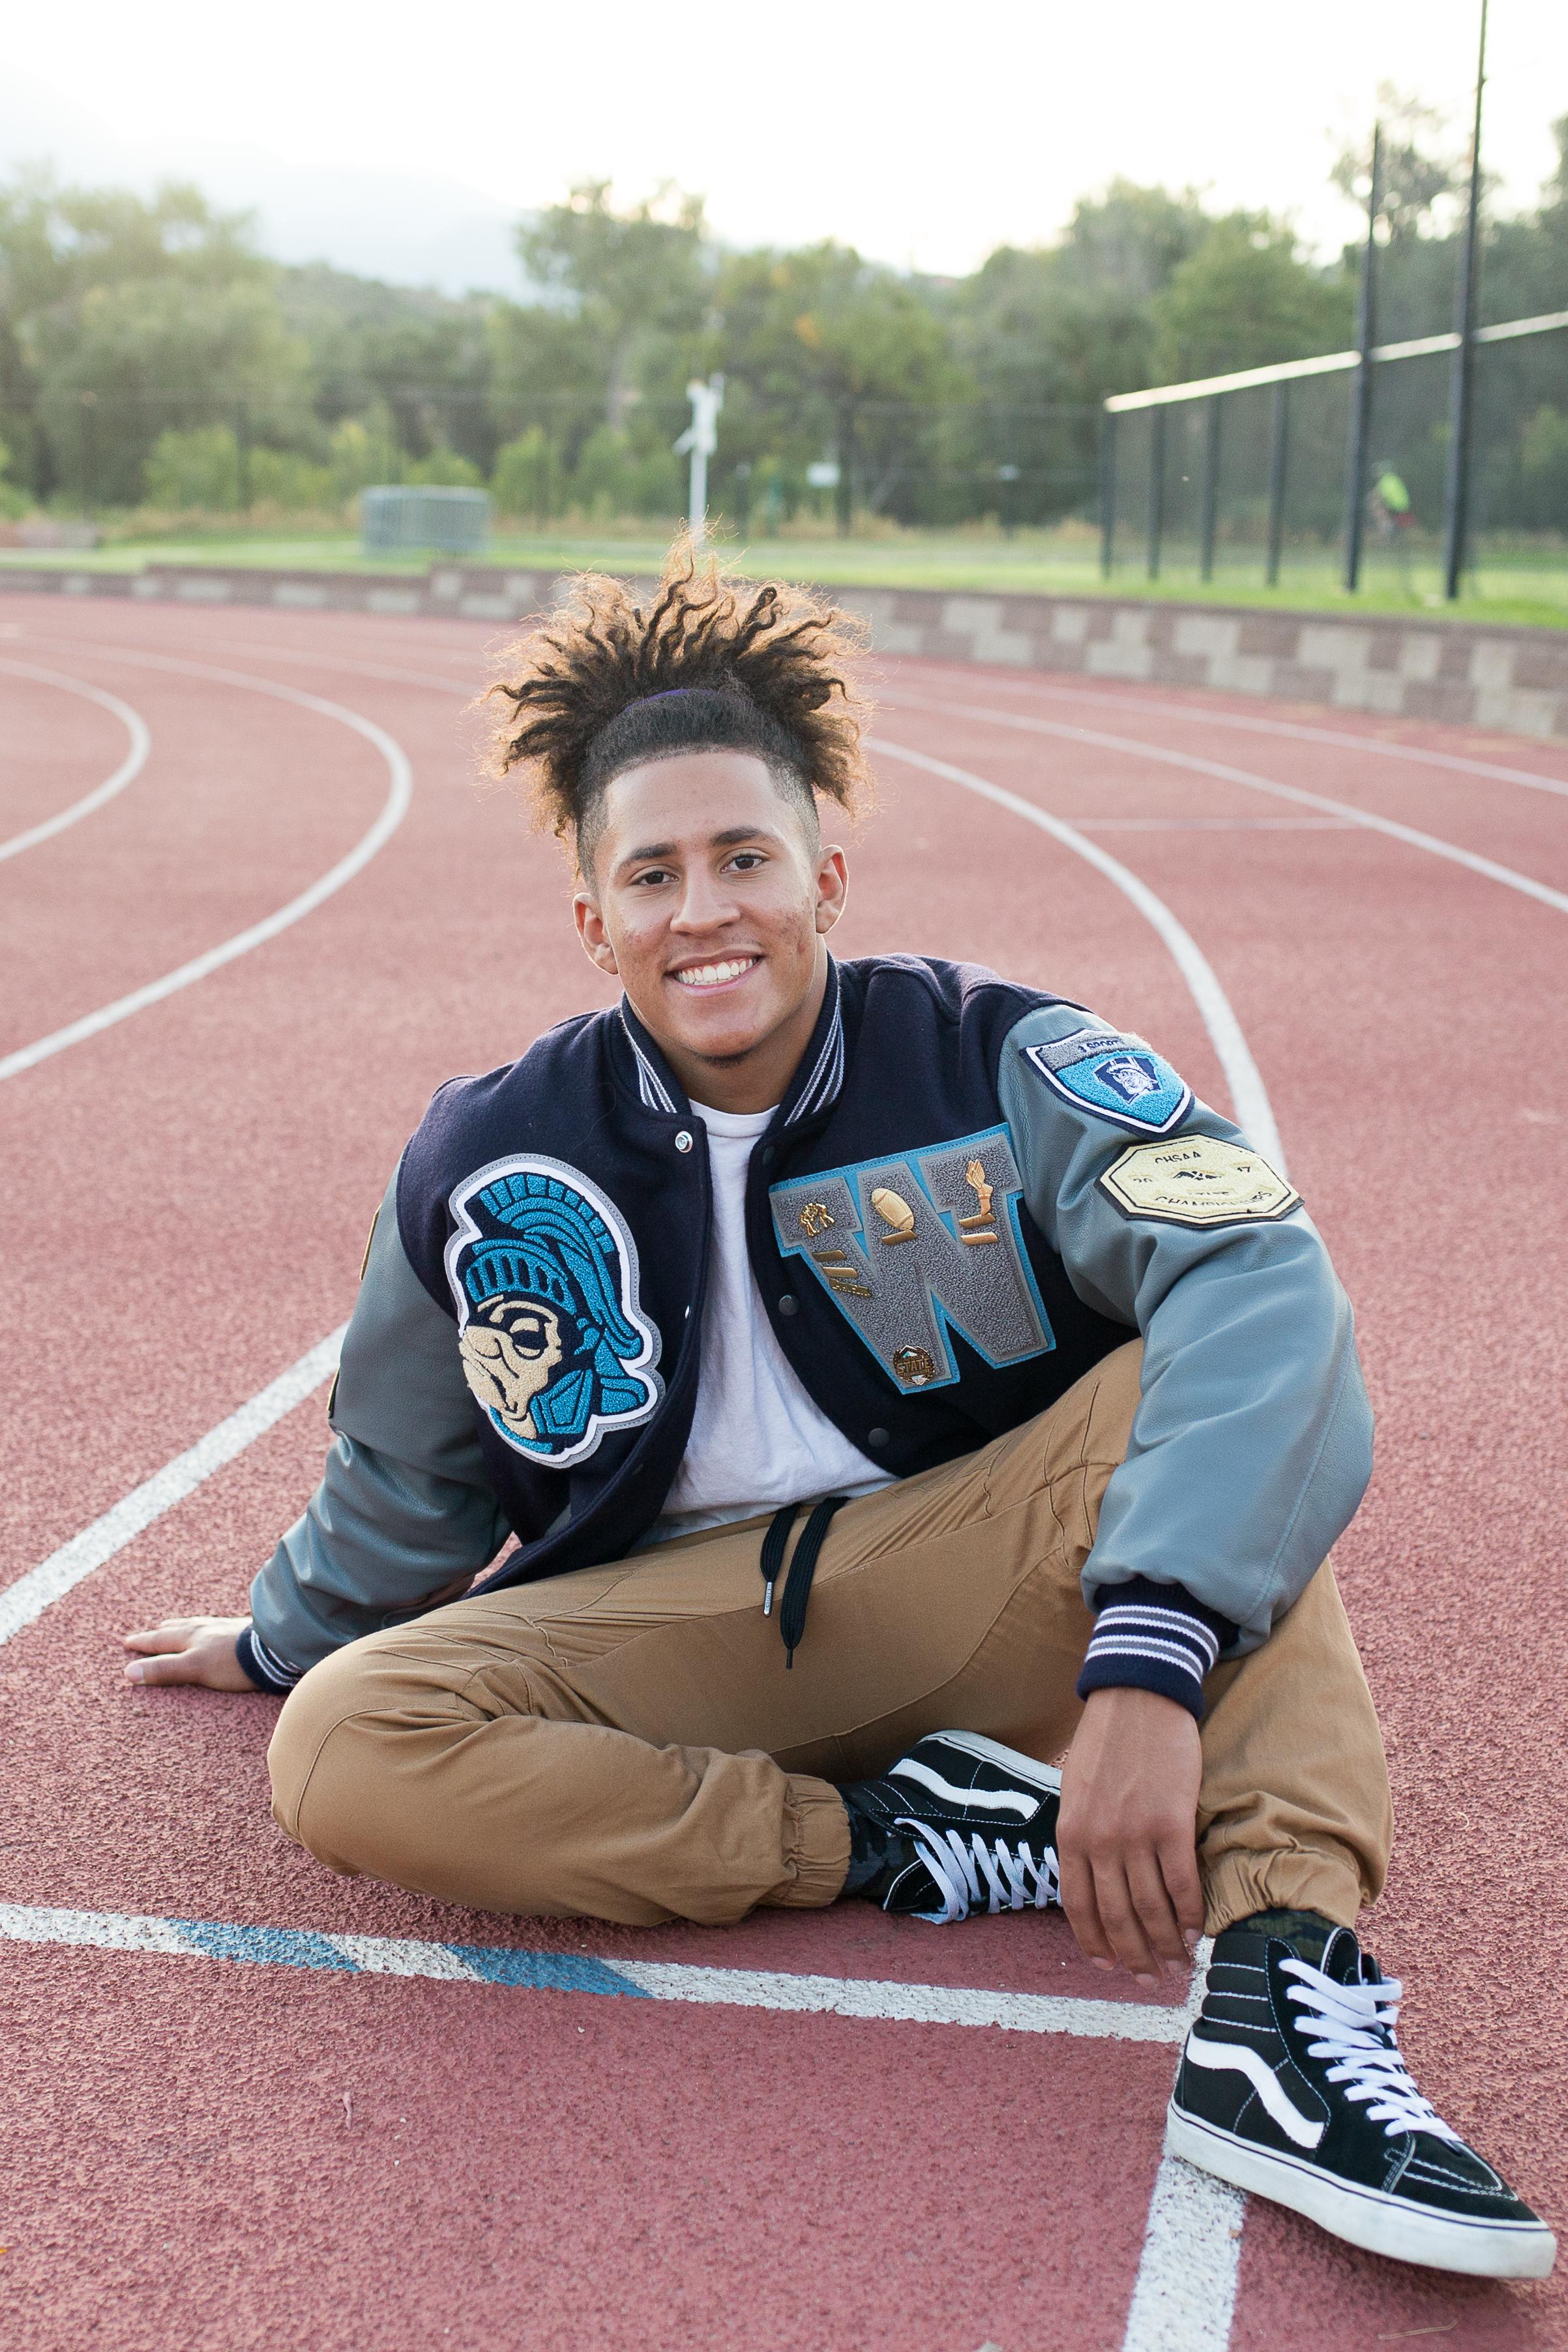 Colorado Springs Senior Photography Widefield high school senior in varsity jacket sitting on a running track